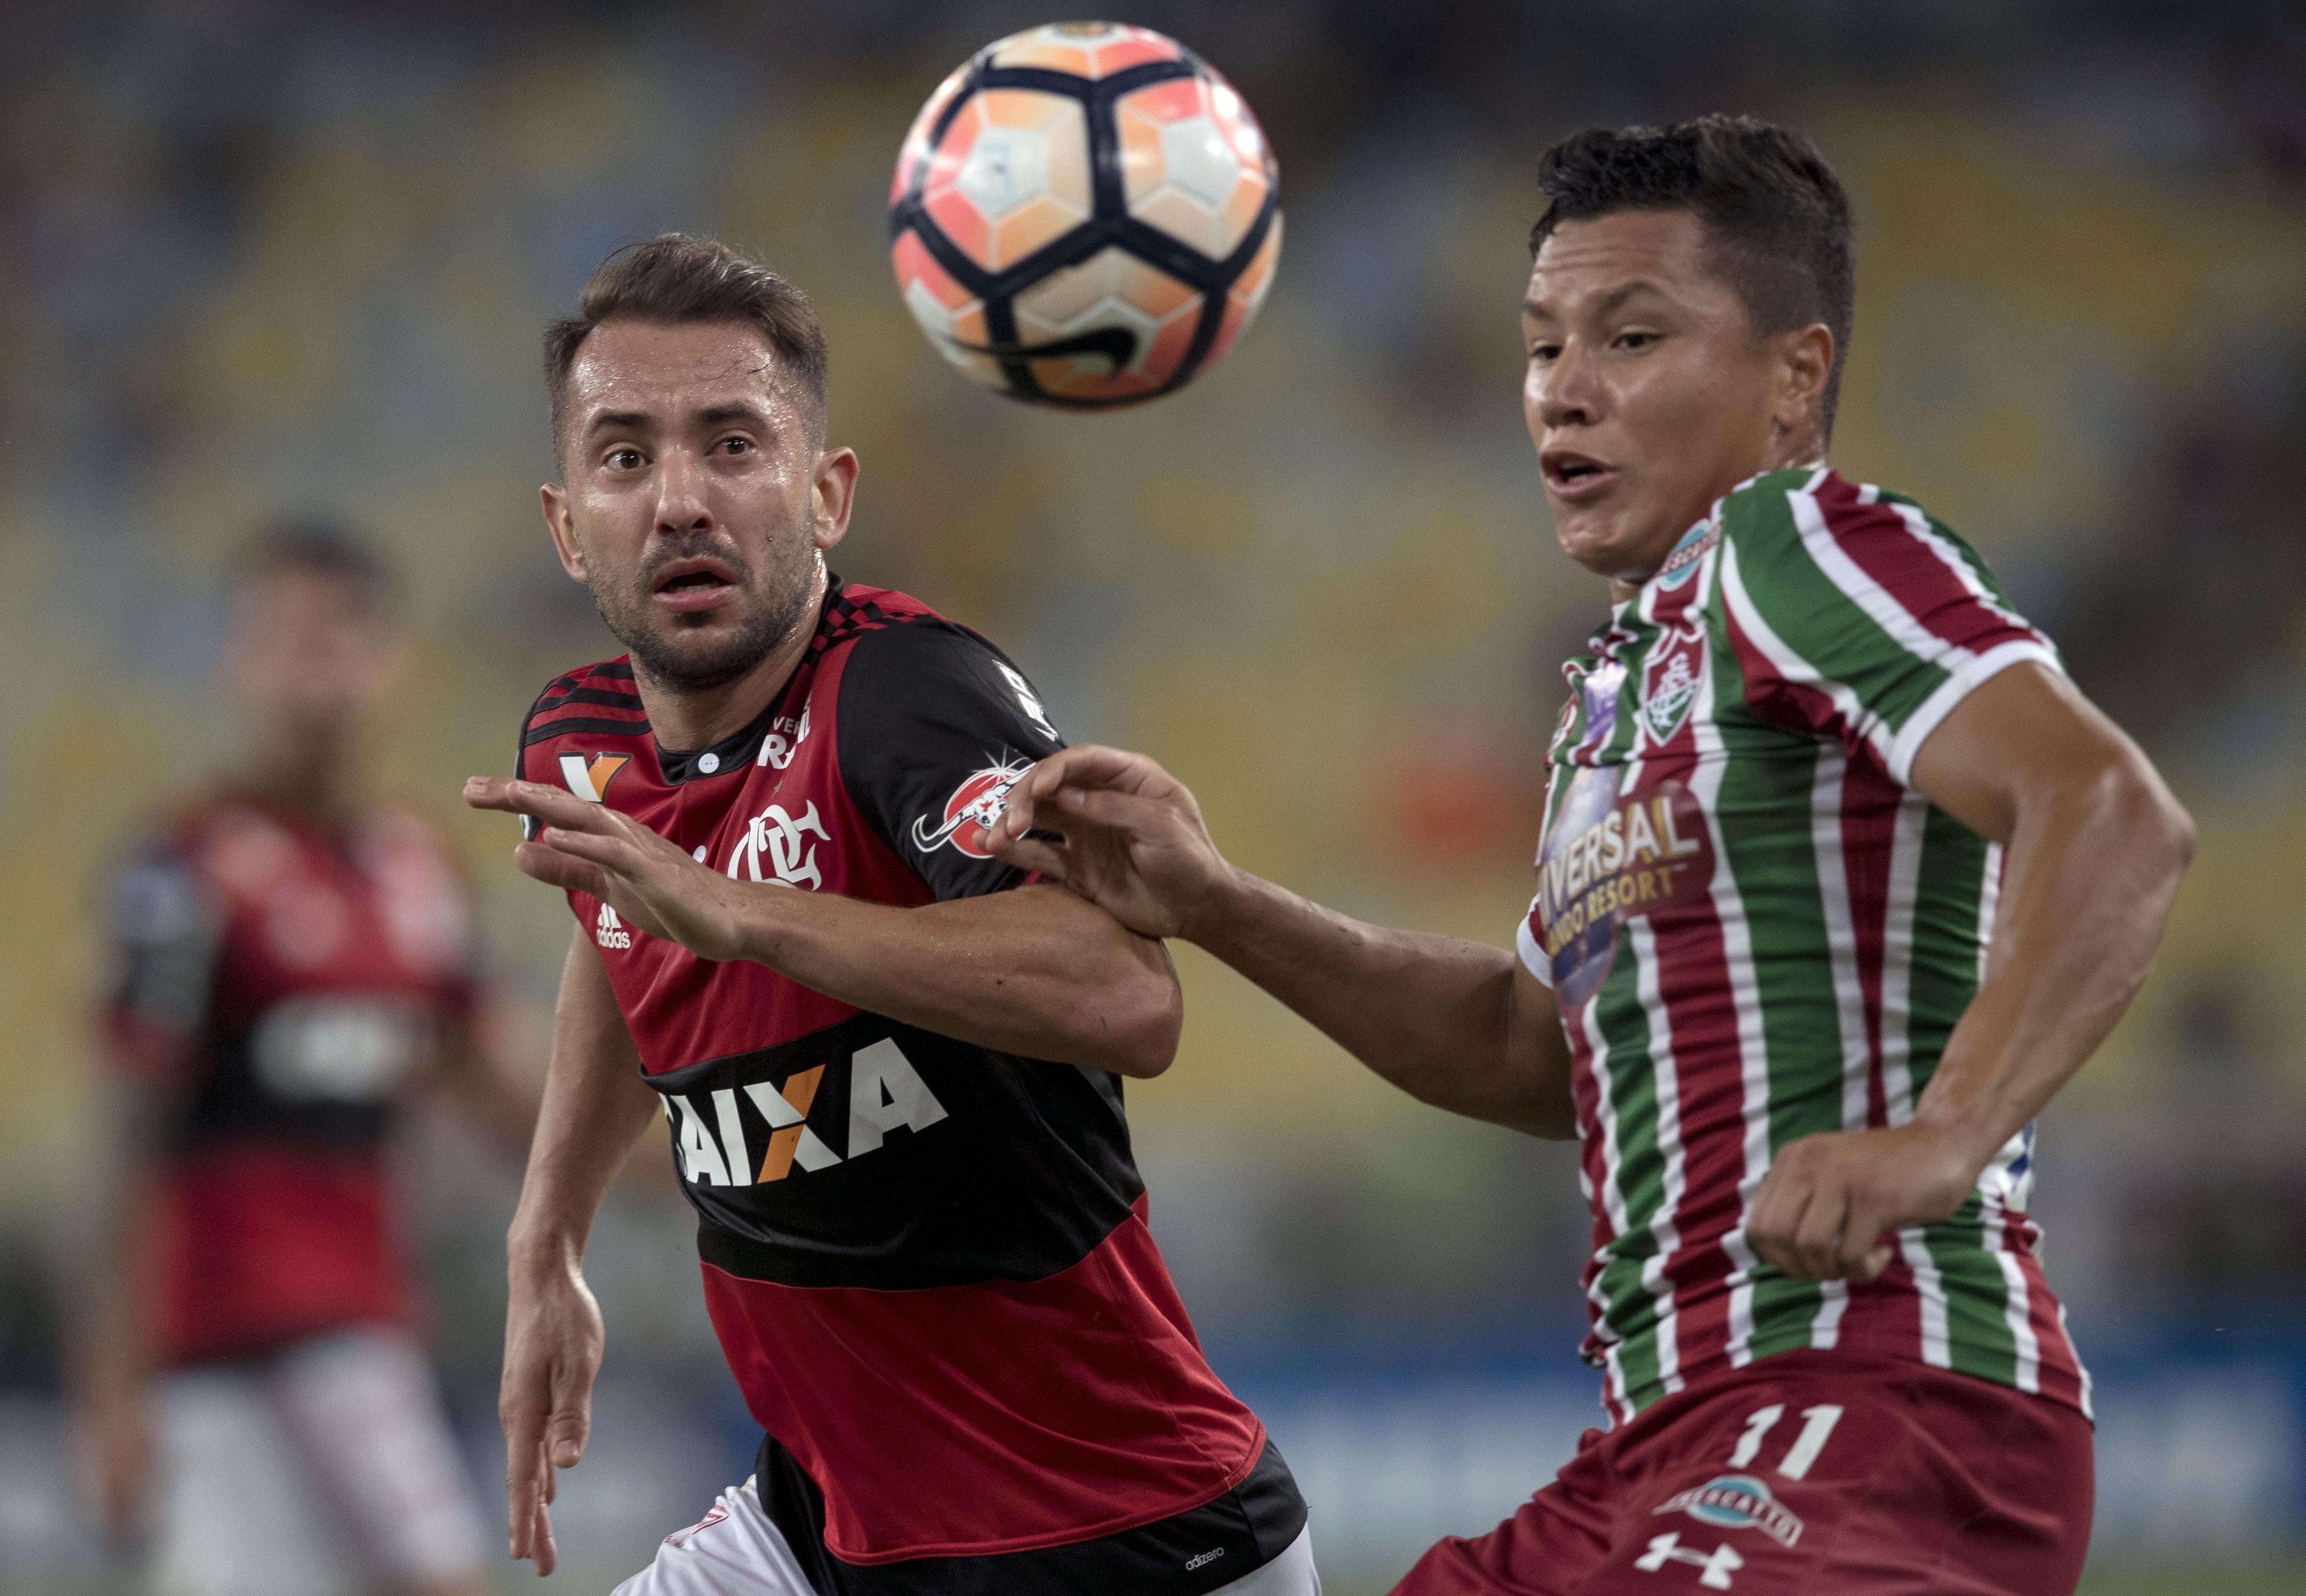 AFP Sul-Americana 2017 Flamengo Fluminense